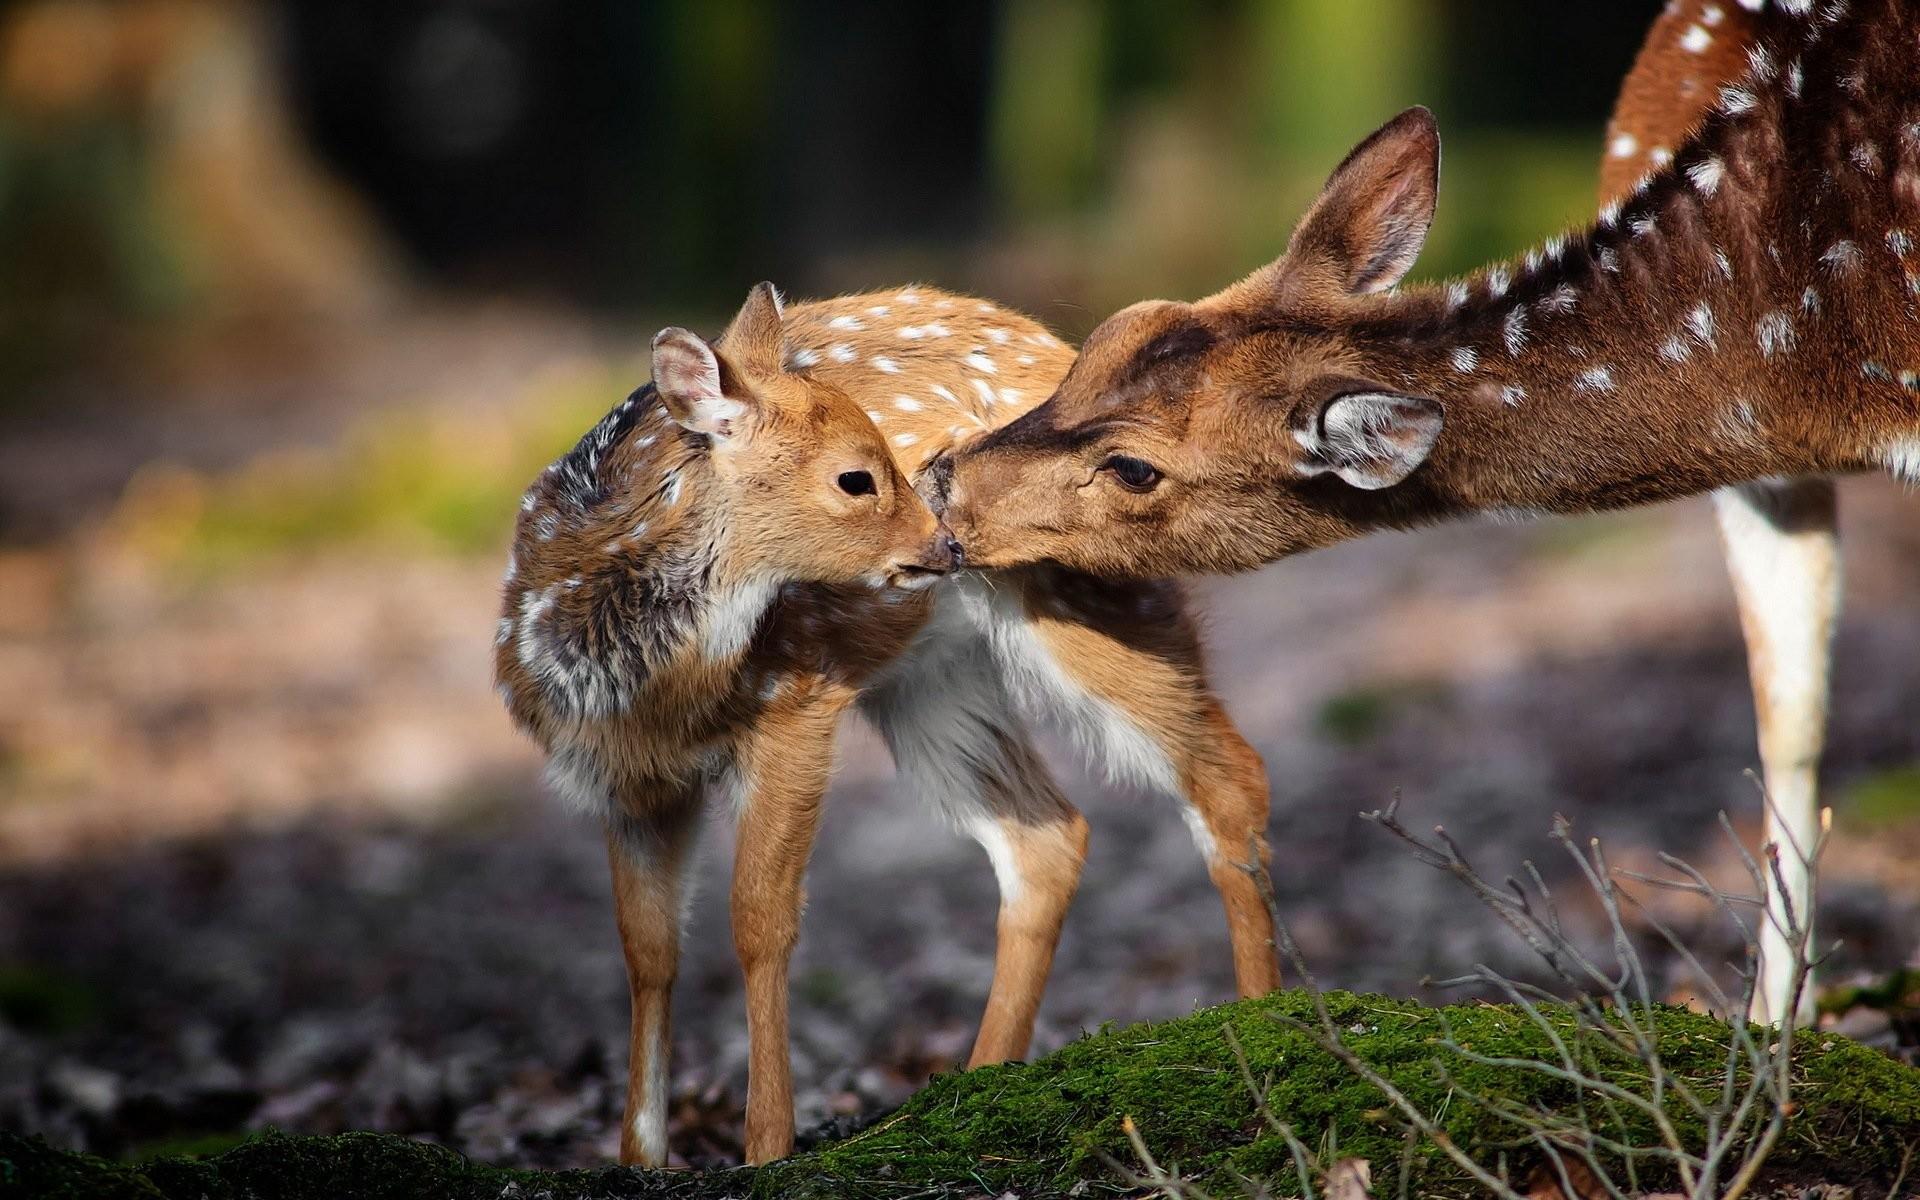 Res: 1920x1200, HD Wallpaper | Background Image ID:390950.  Animal Deer